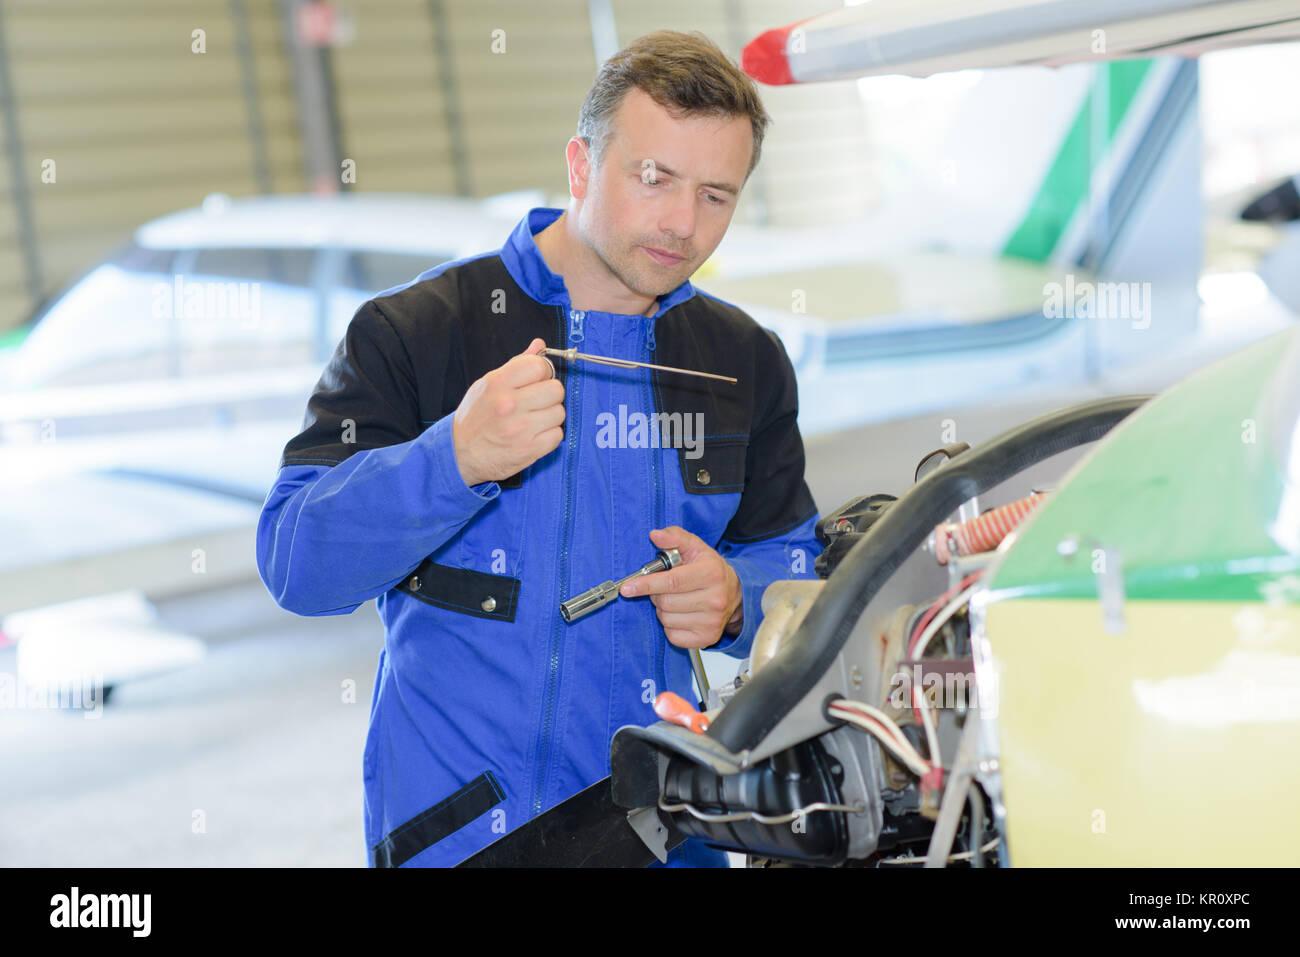 fixing an aiplane - Stock Image